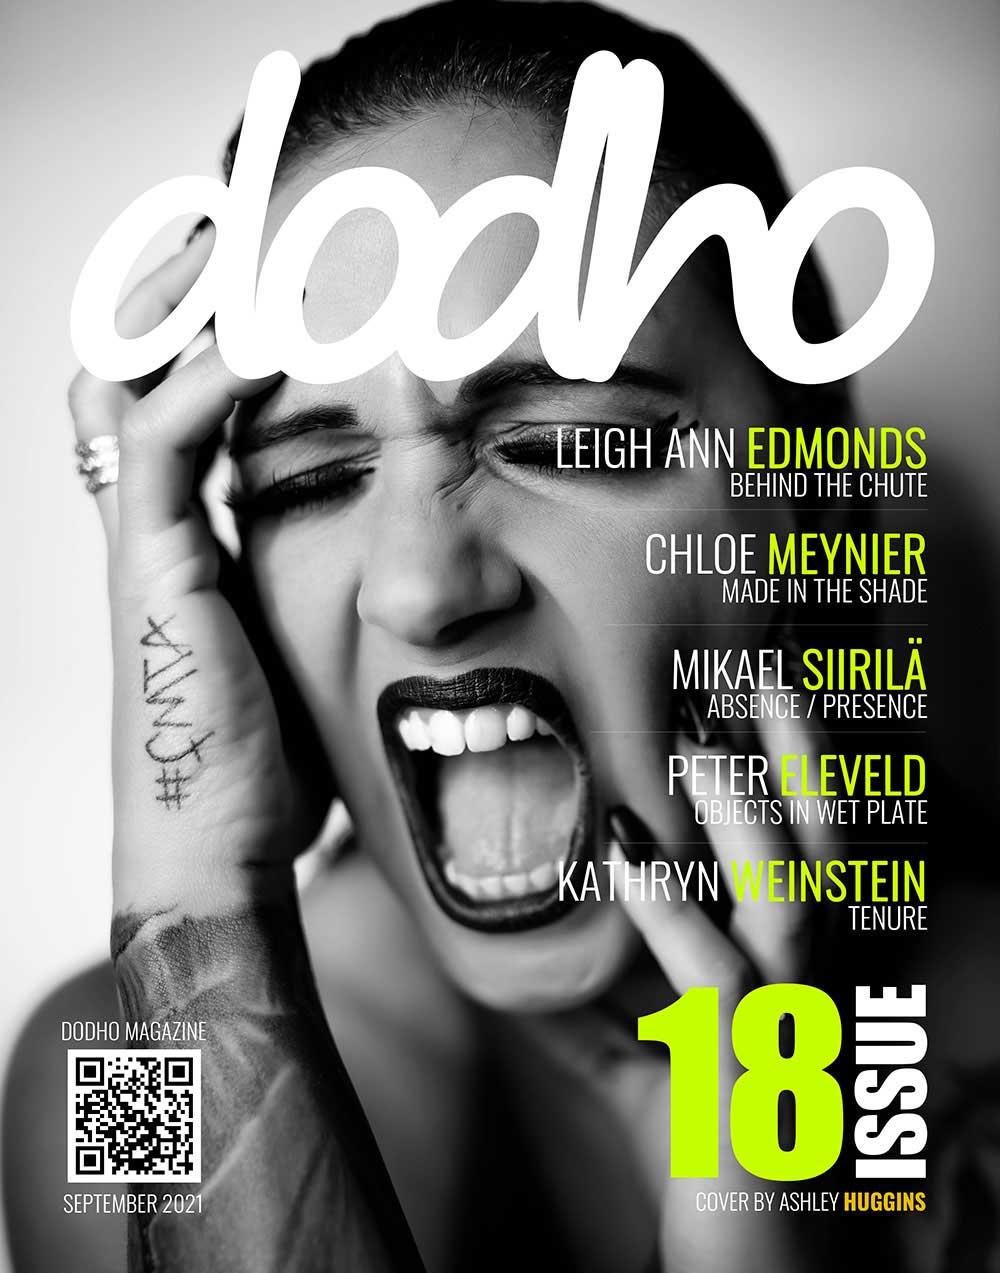 https://www.dodho.com/wp-content/uploads/2021/09/cover18L.jpg